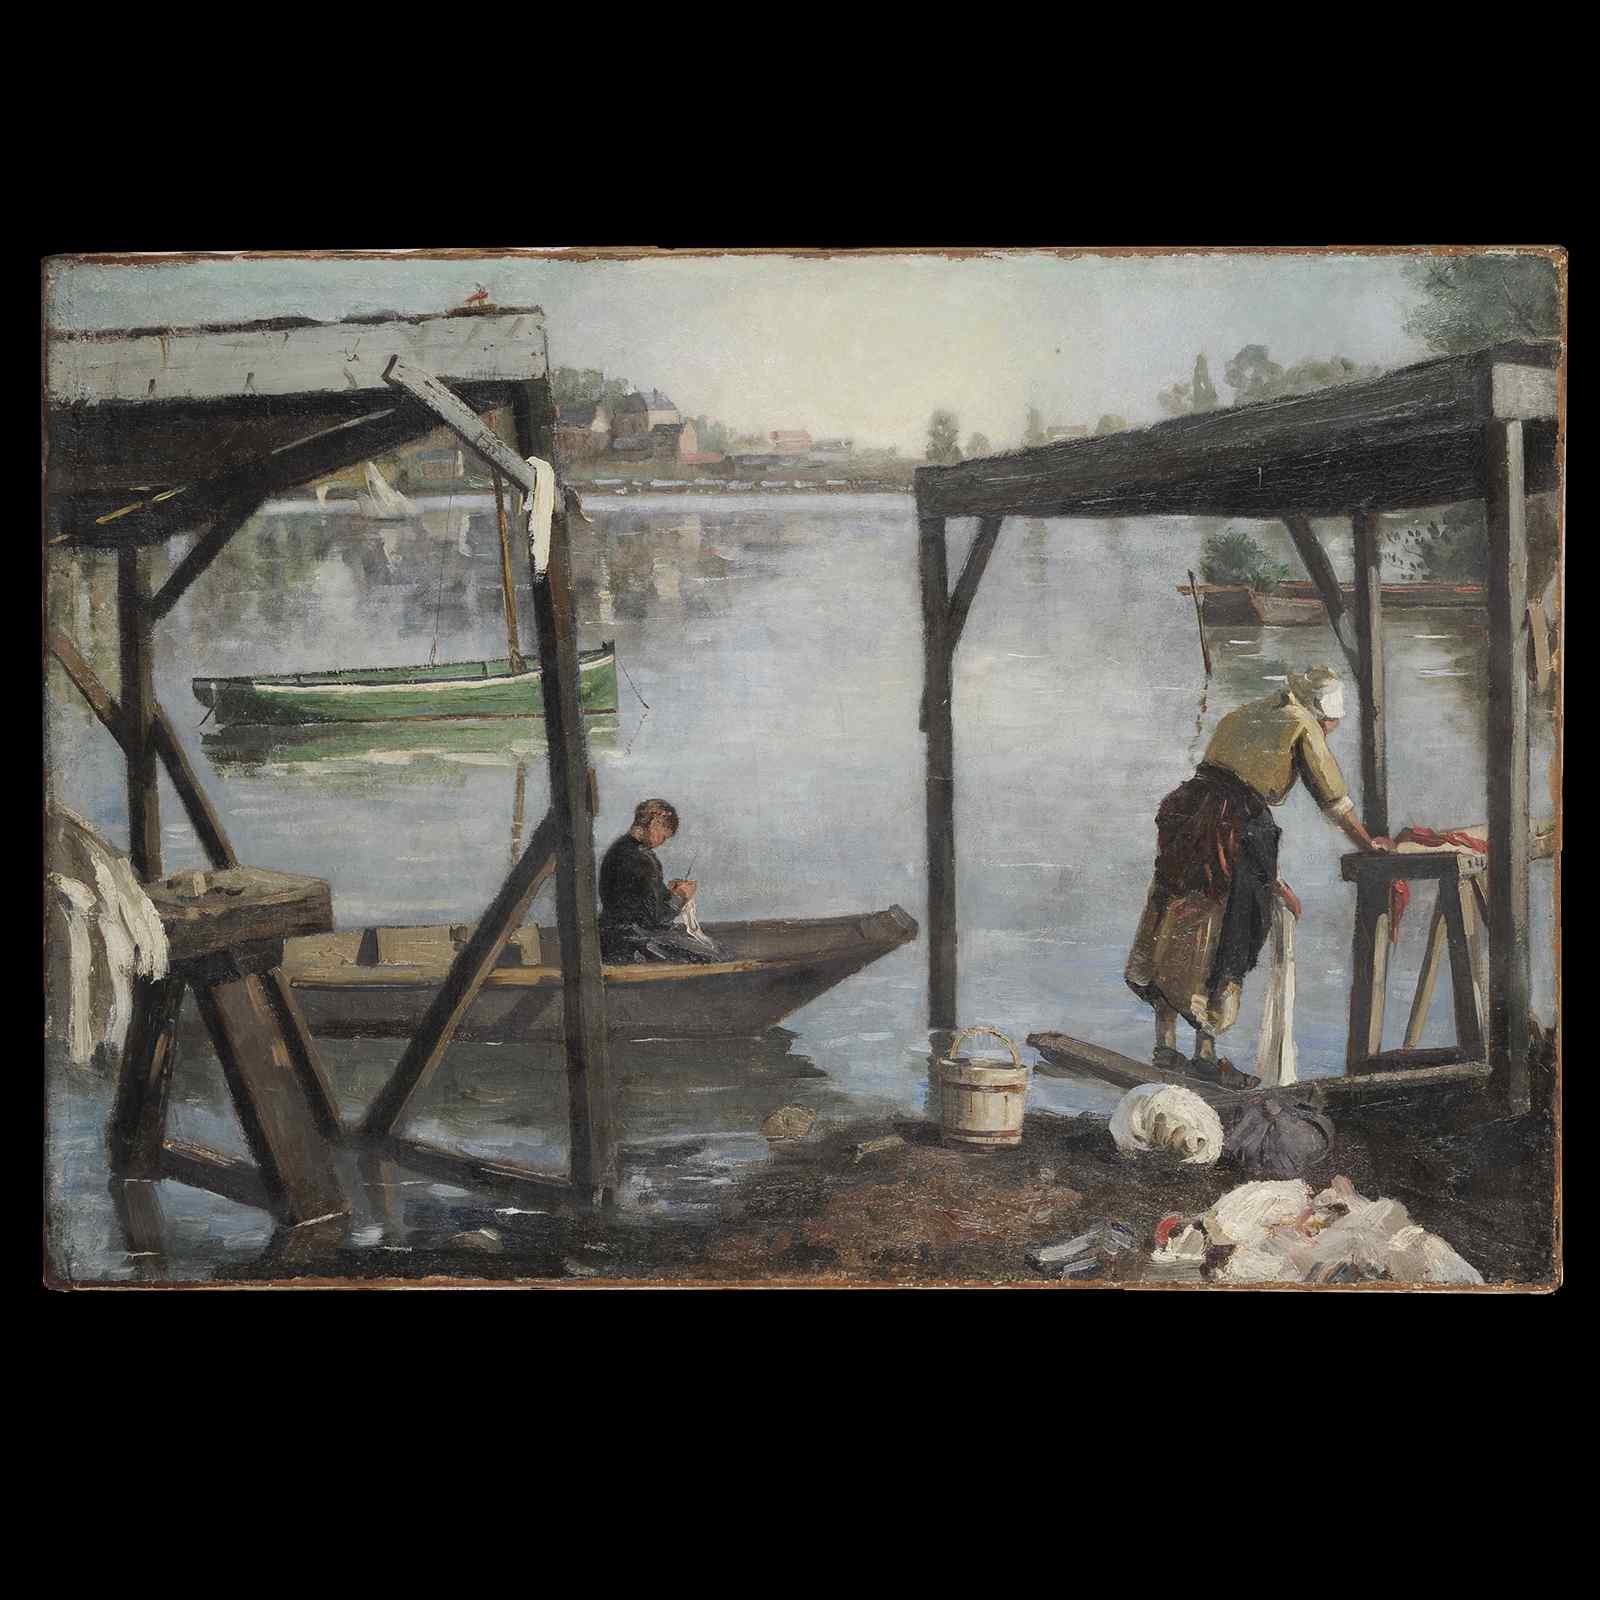 vivace Riverfront - Scuola Francese impressionista